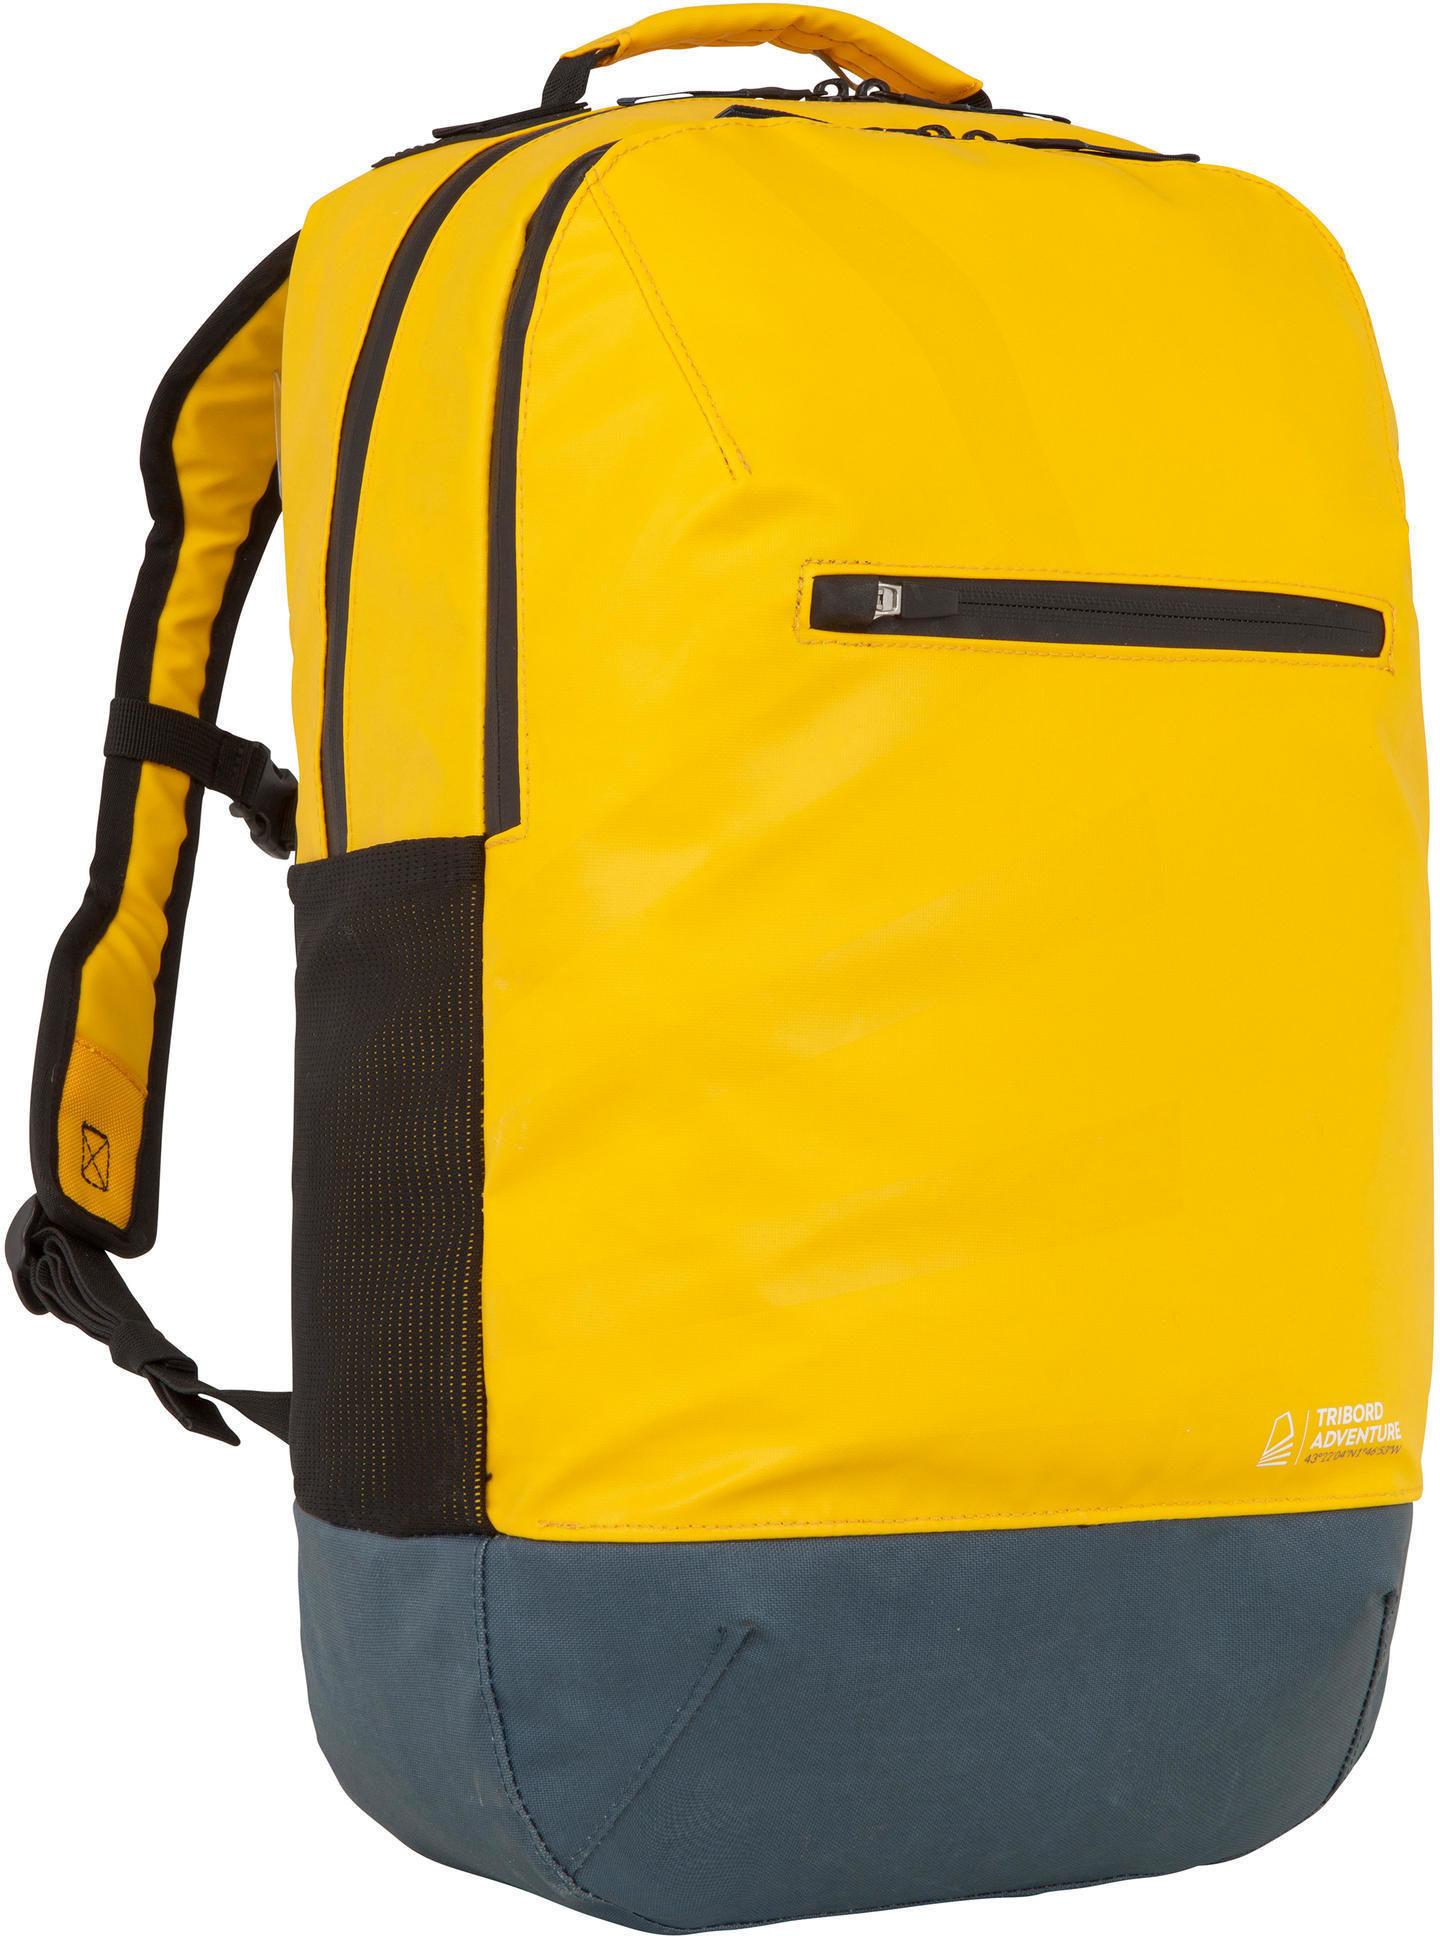 Plecak Żeglarski 25 L